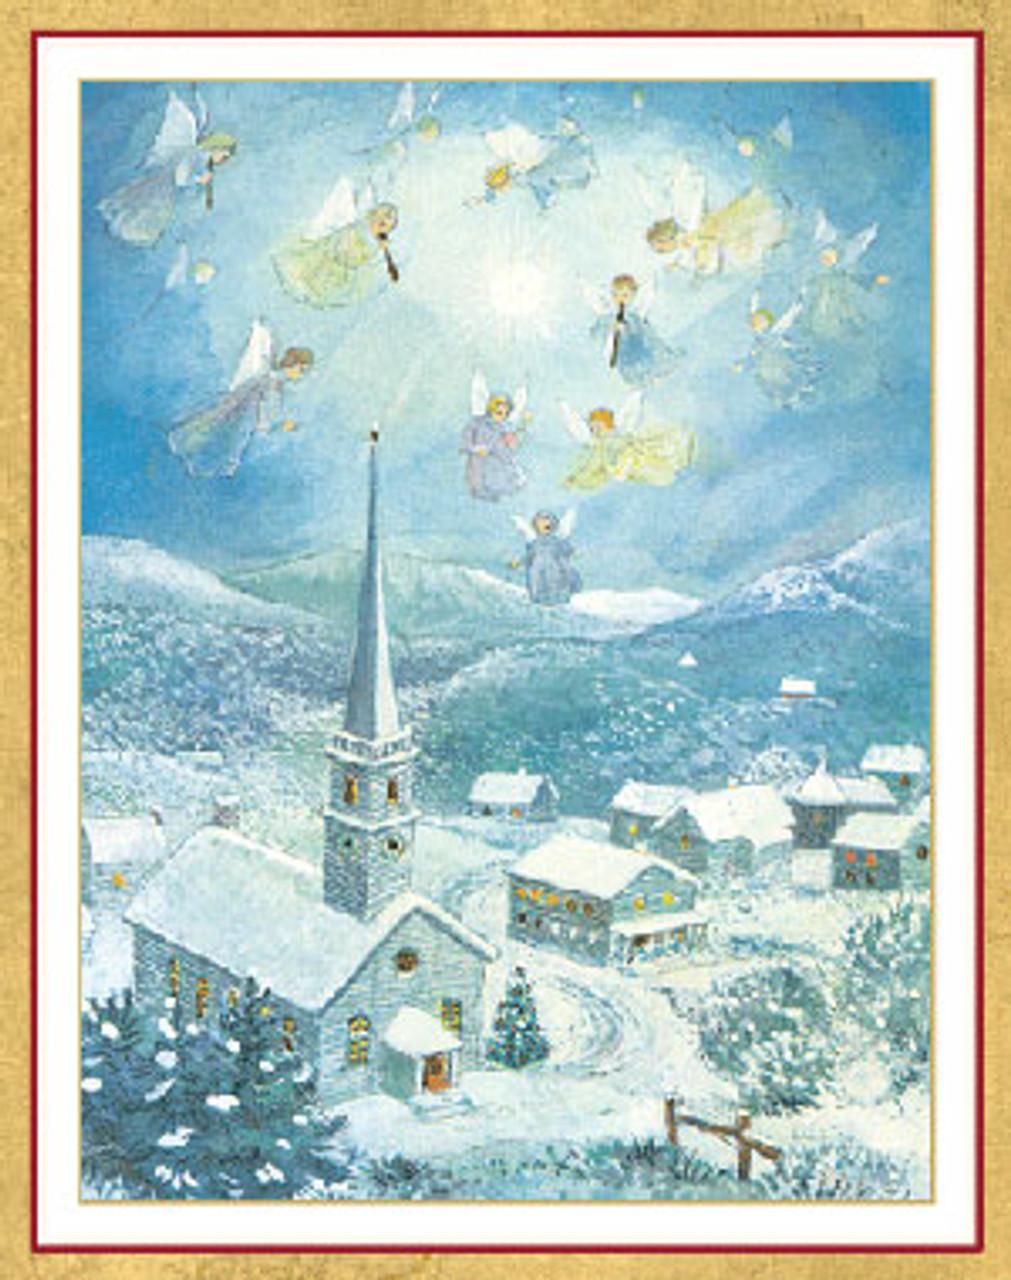 Angels Christmas Cards.Angels Over Bethlehem Christmas Card